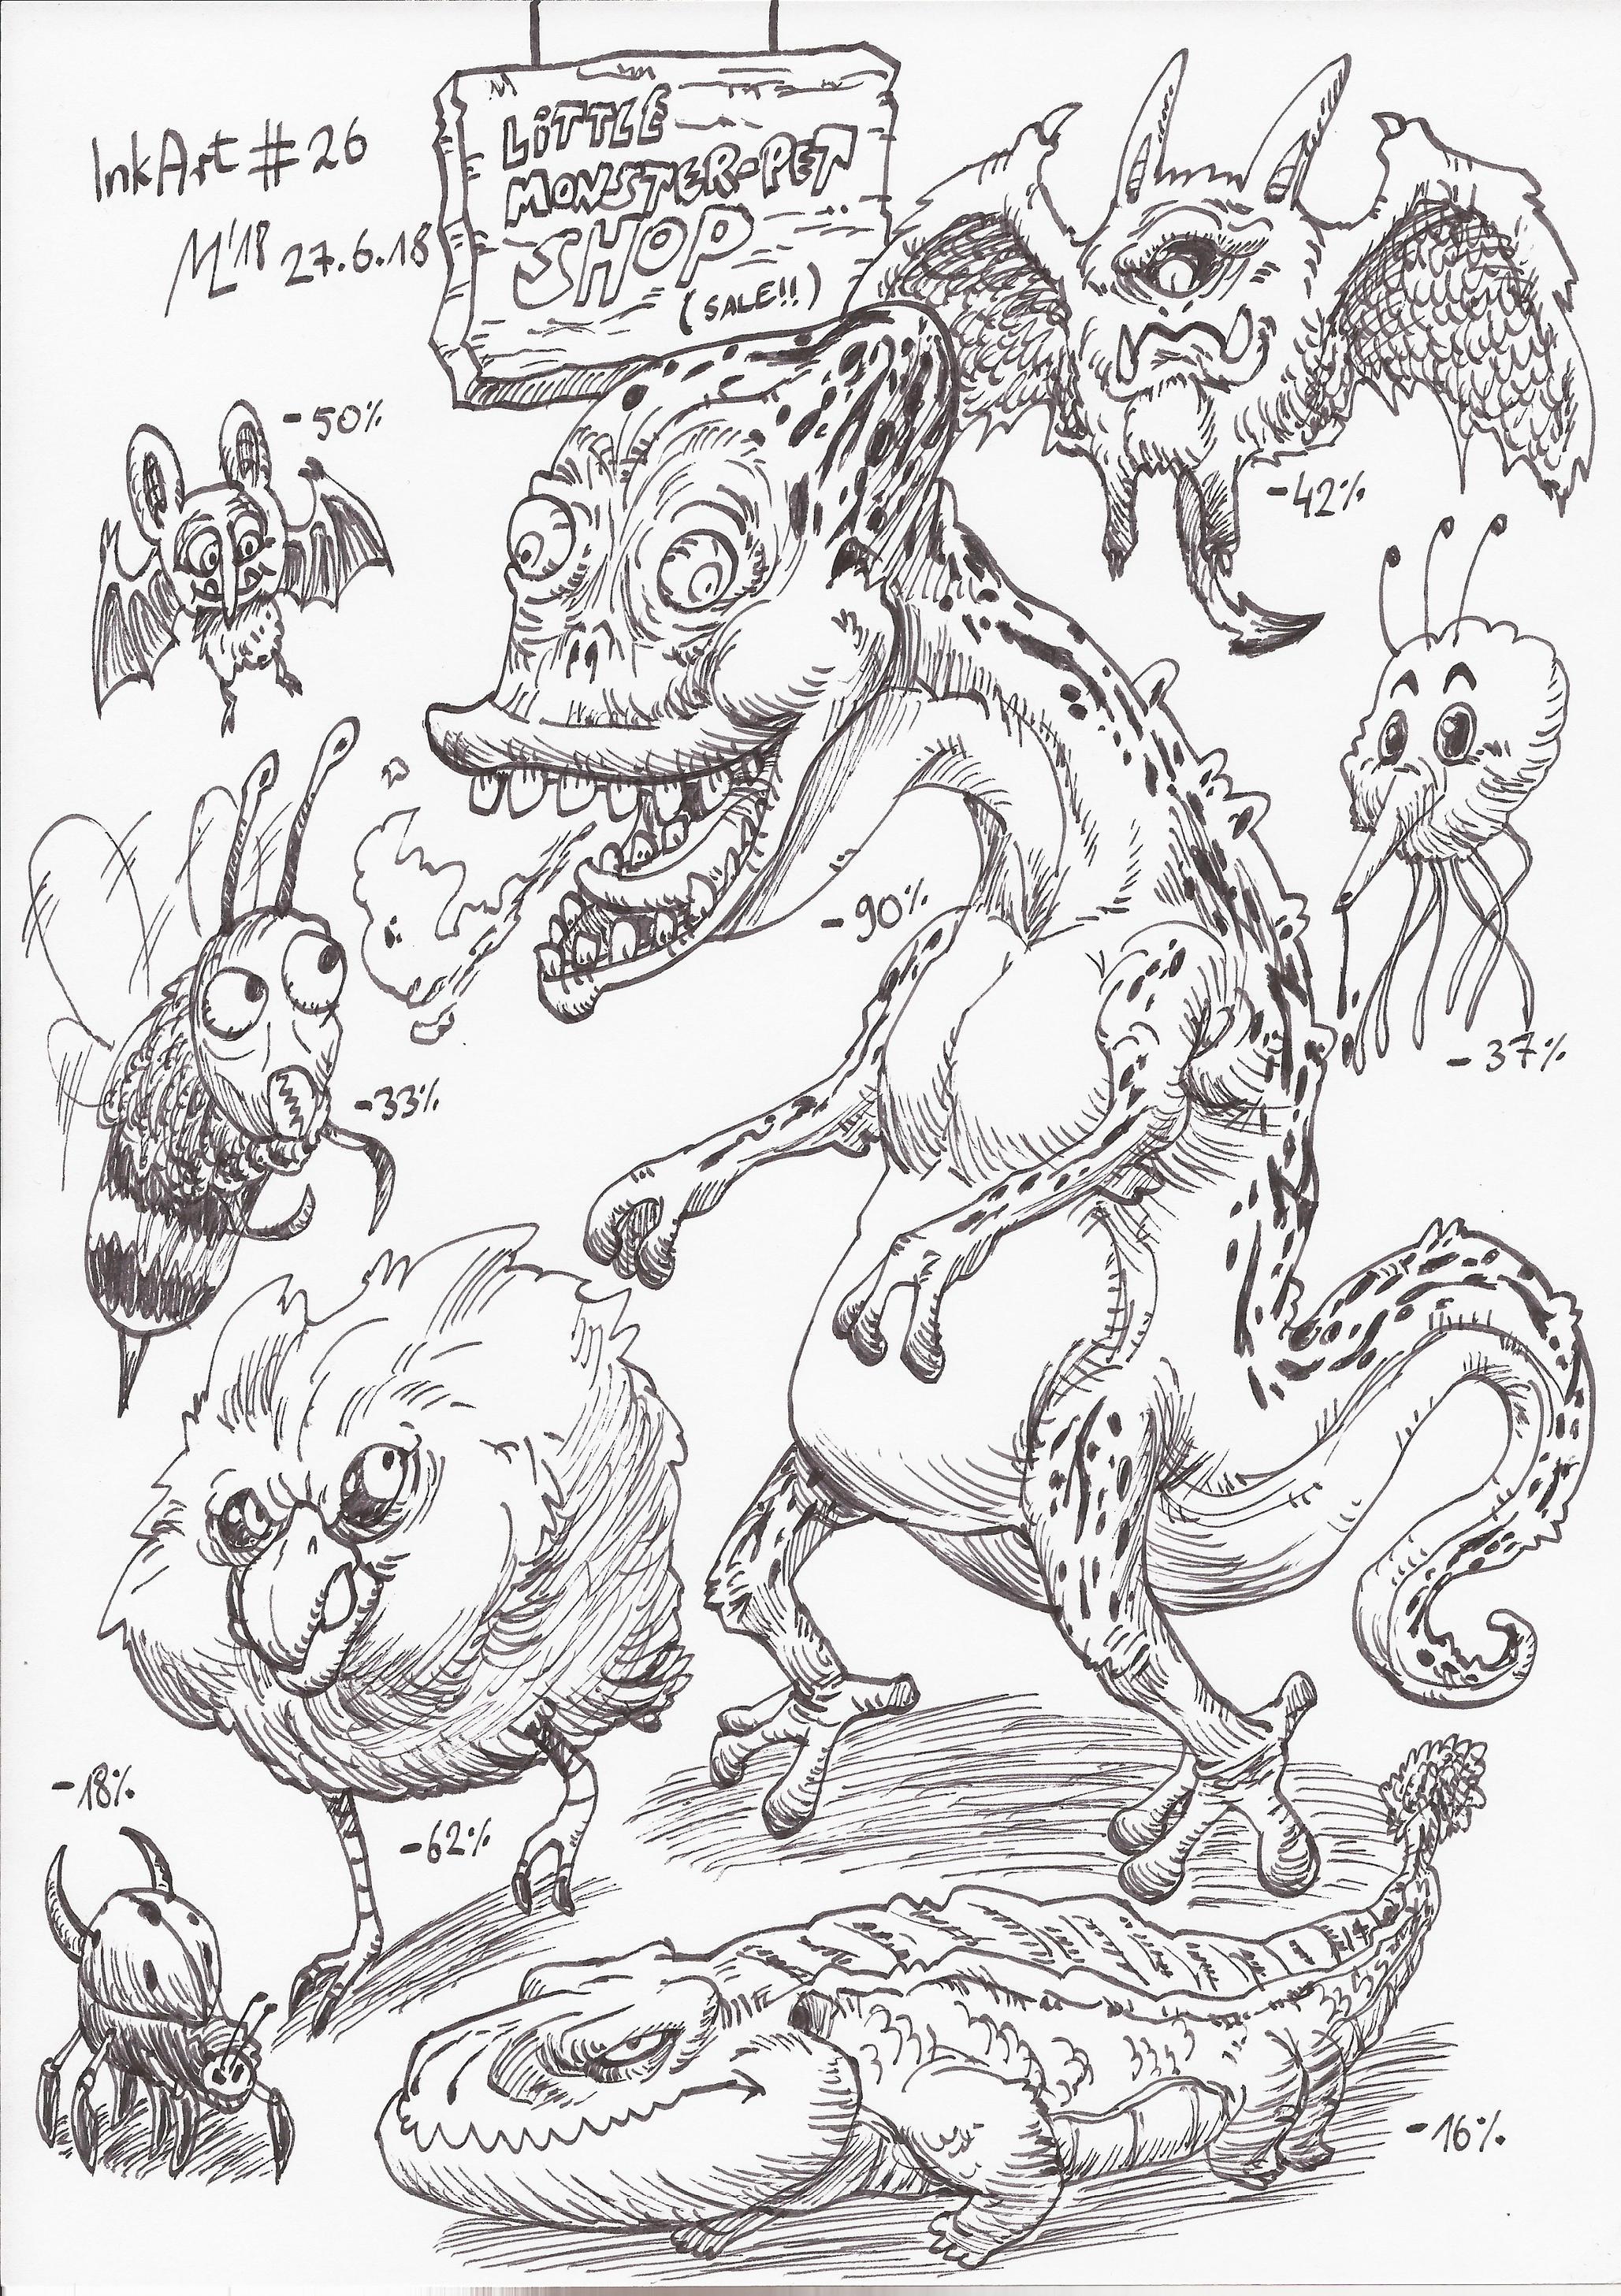 InkArt #26: Monster-Sale!! by blue-hugo